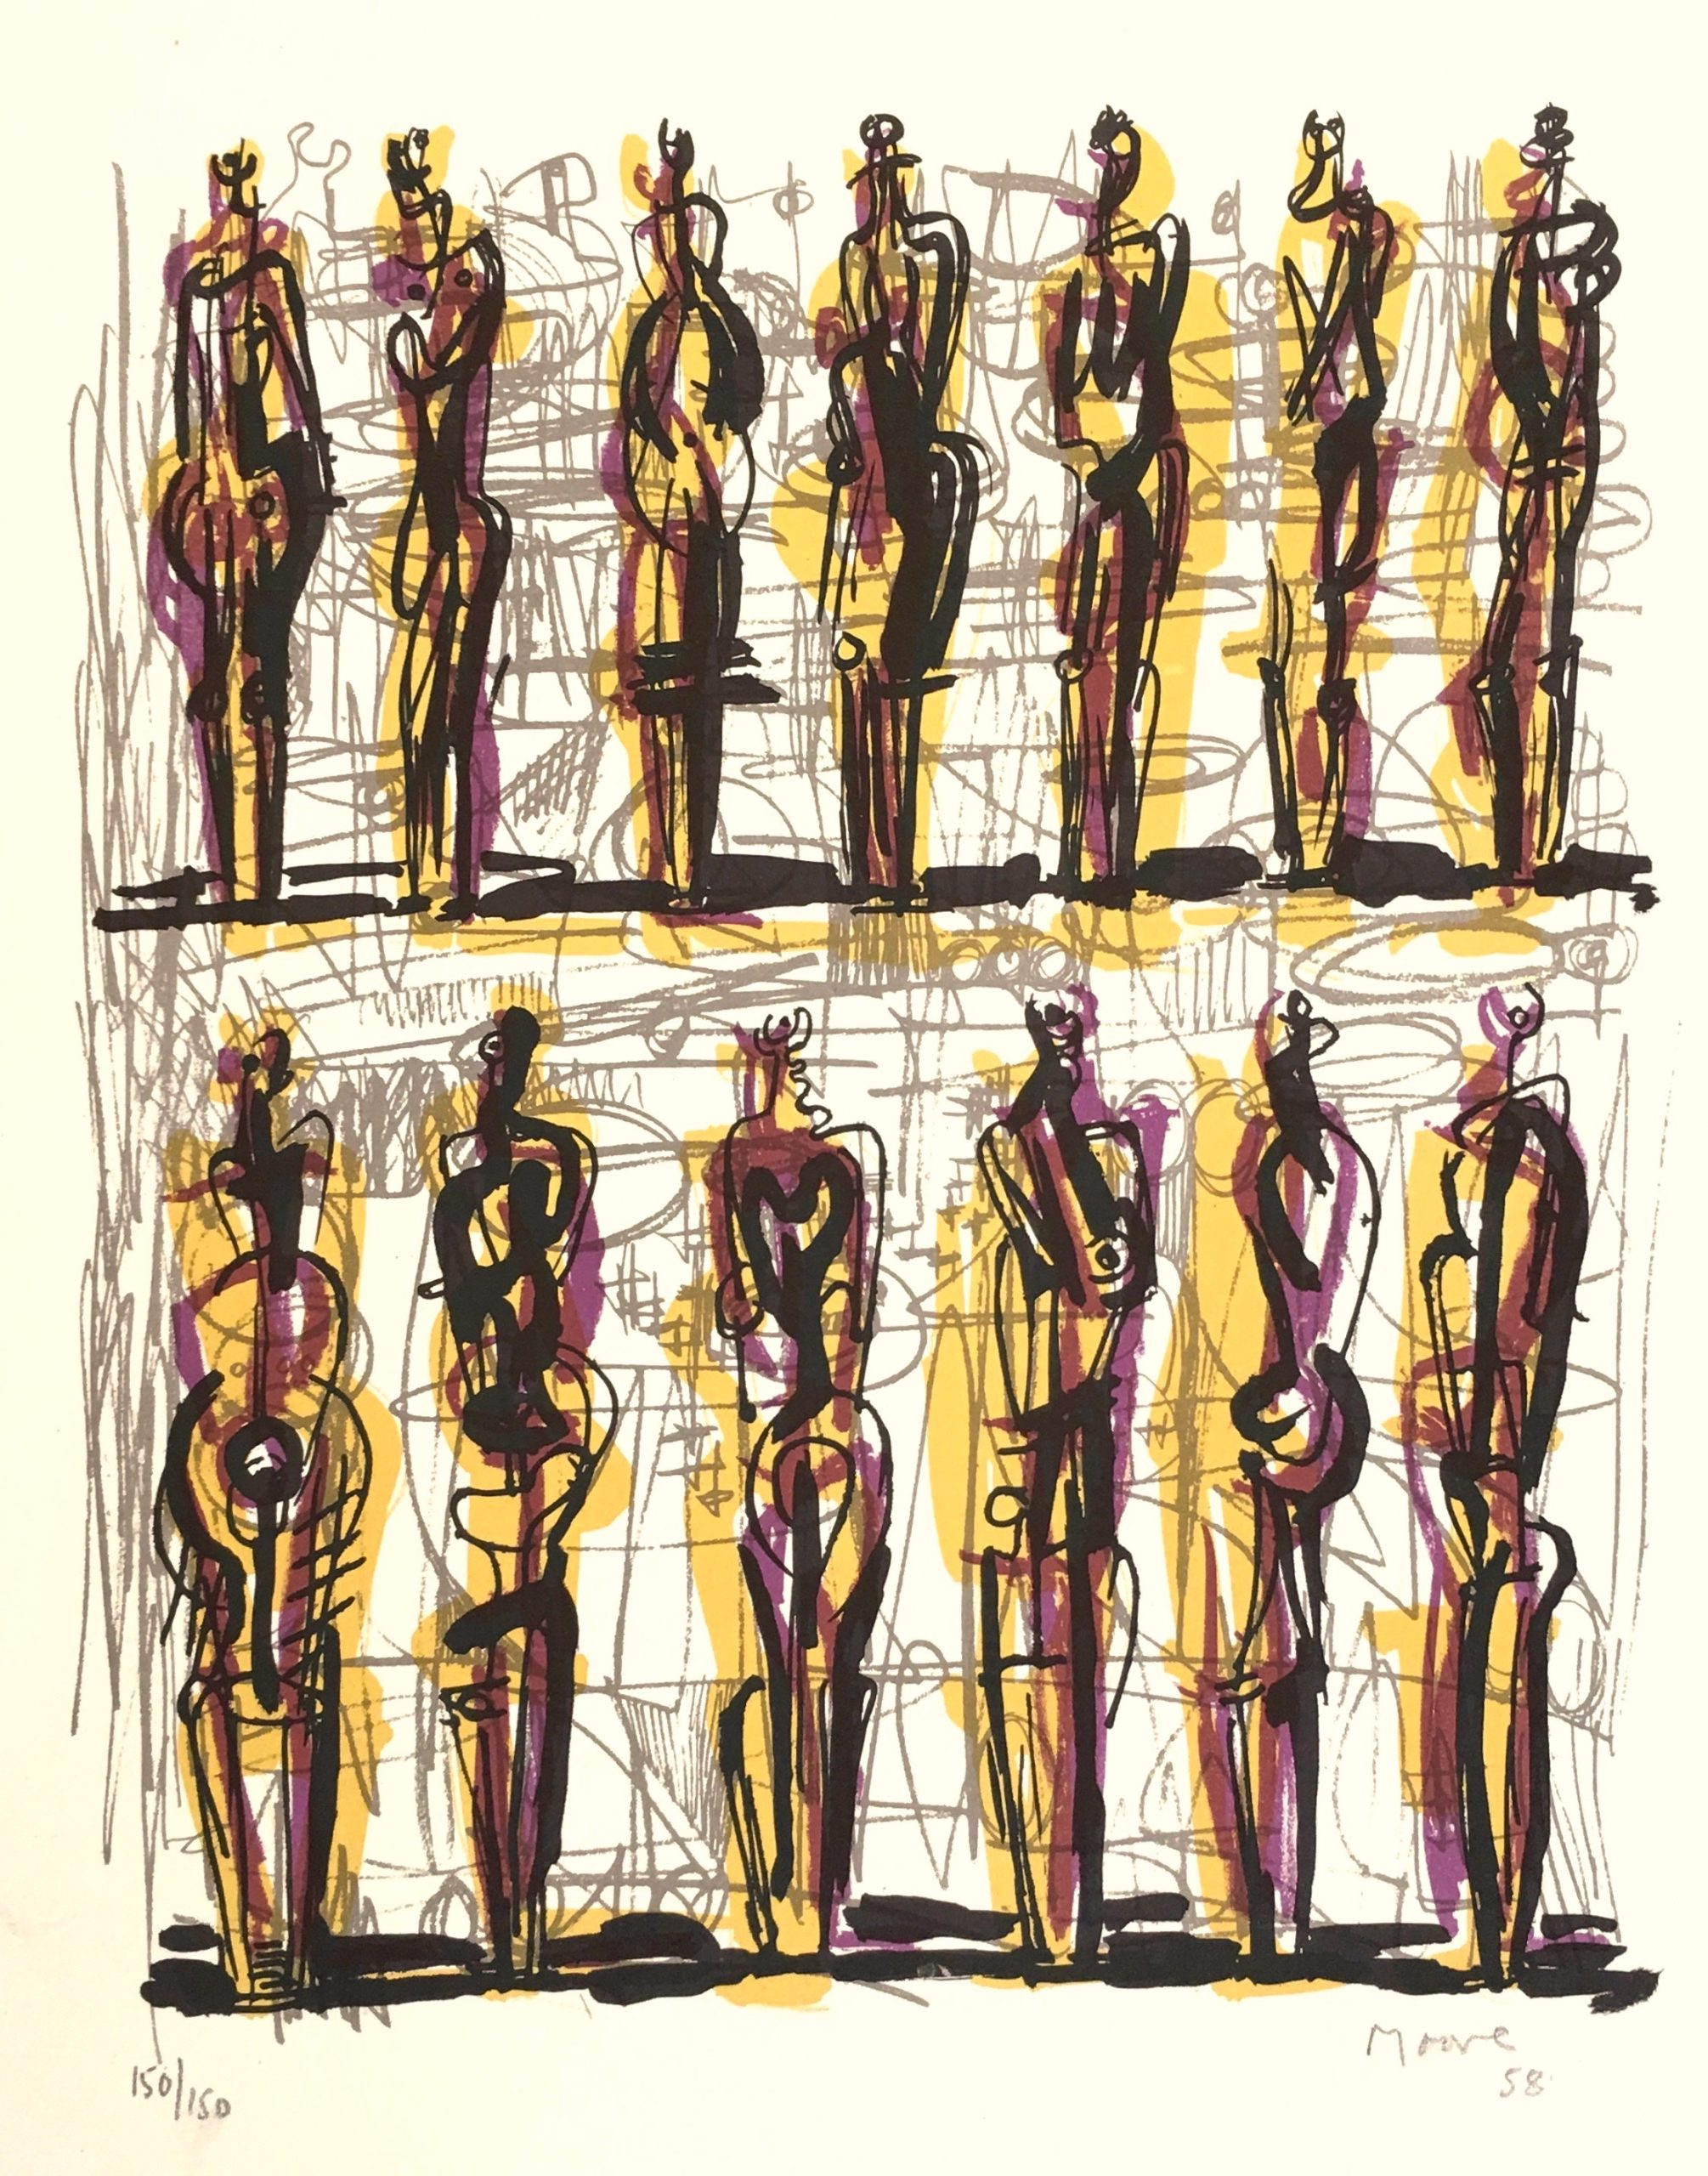 Thirteen Standing Figures by Henry Moore